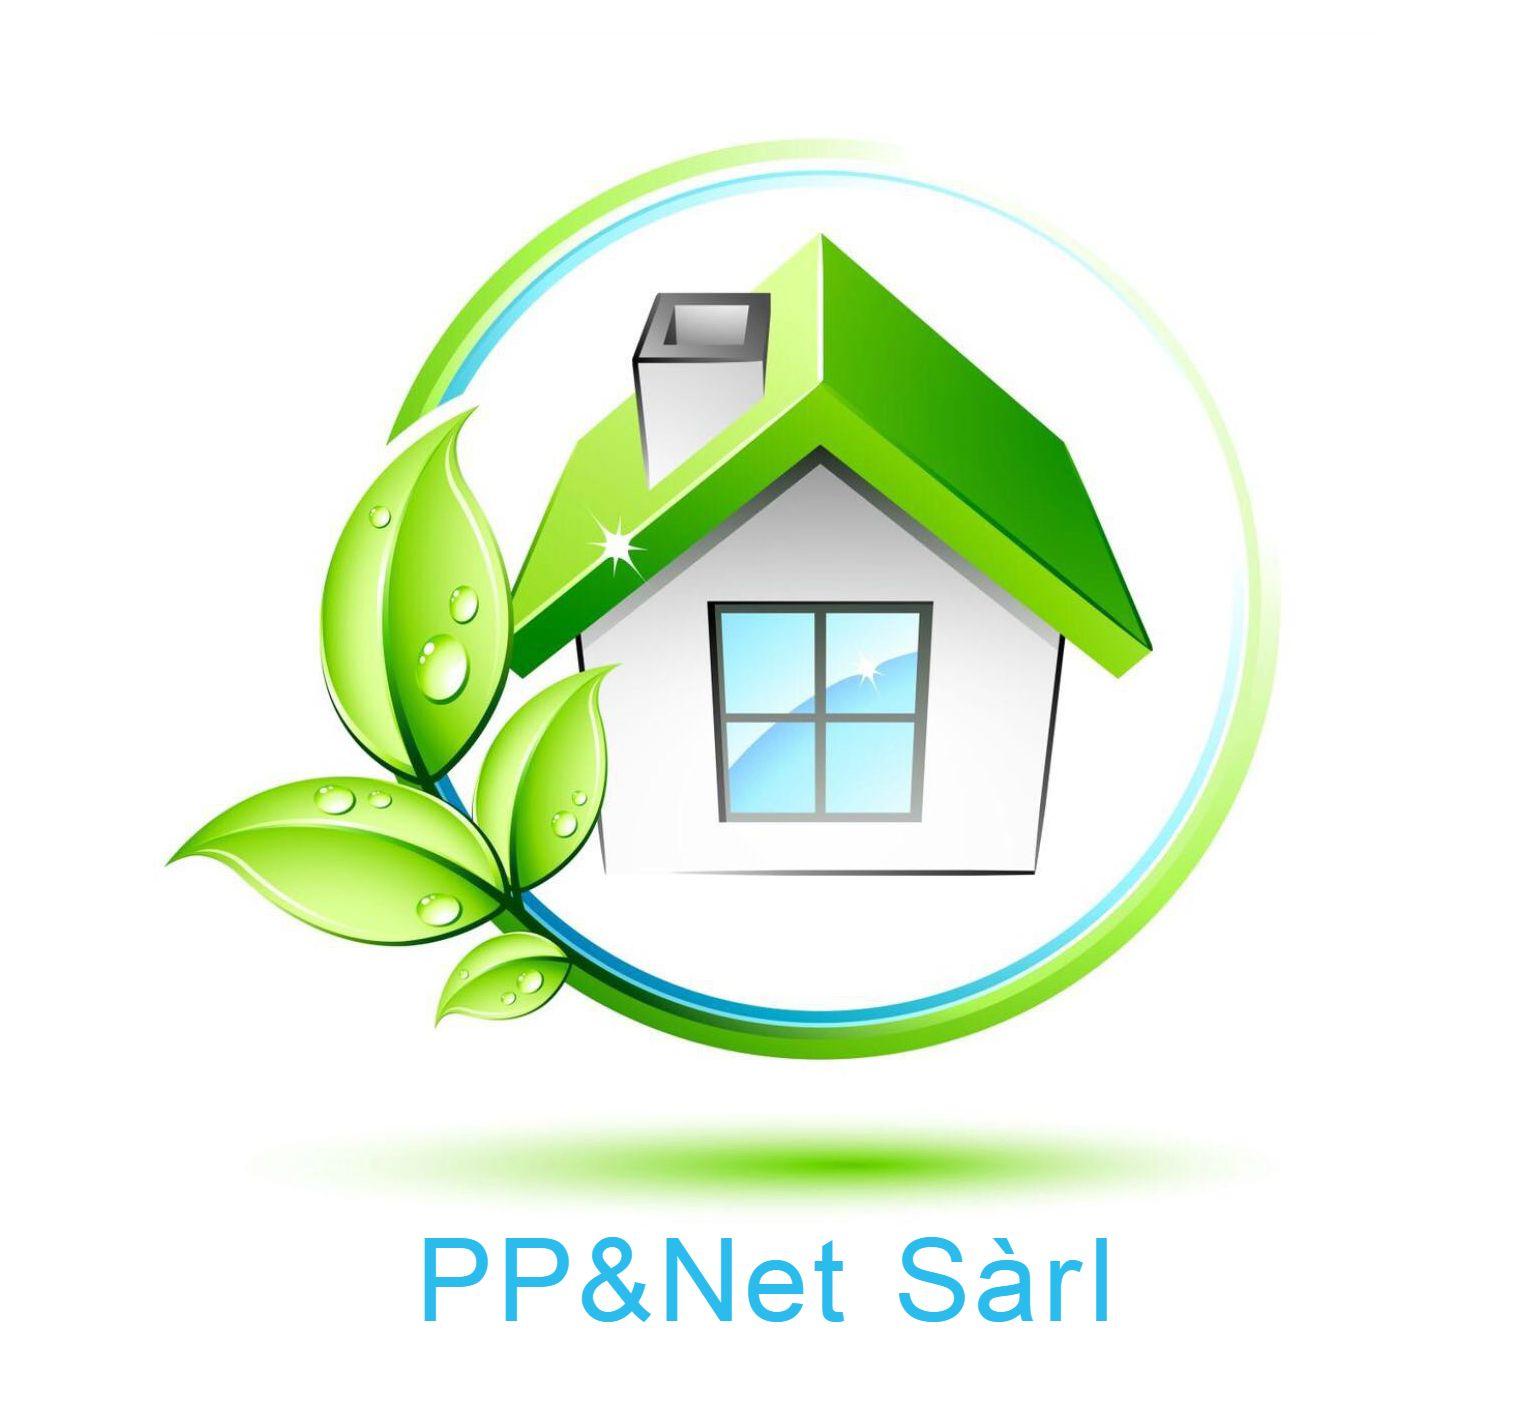 Patrick Propre & Net Sàrl